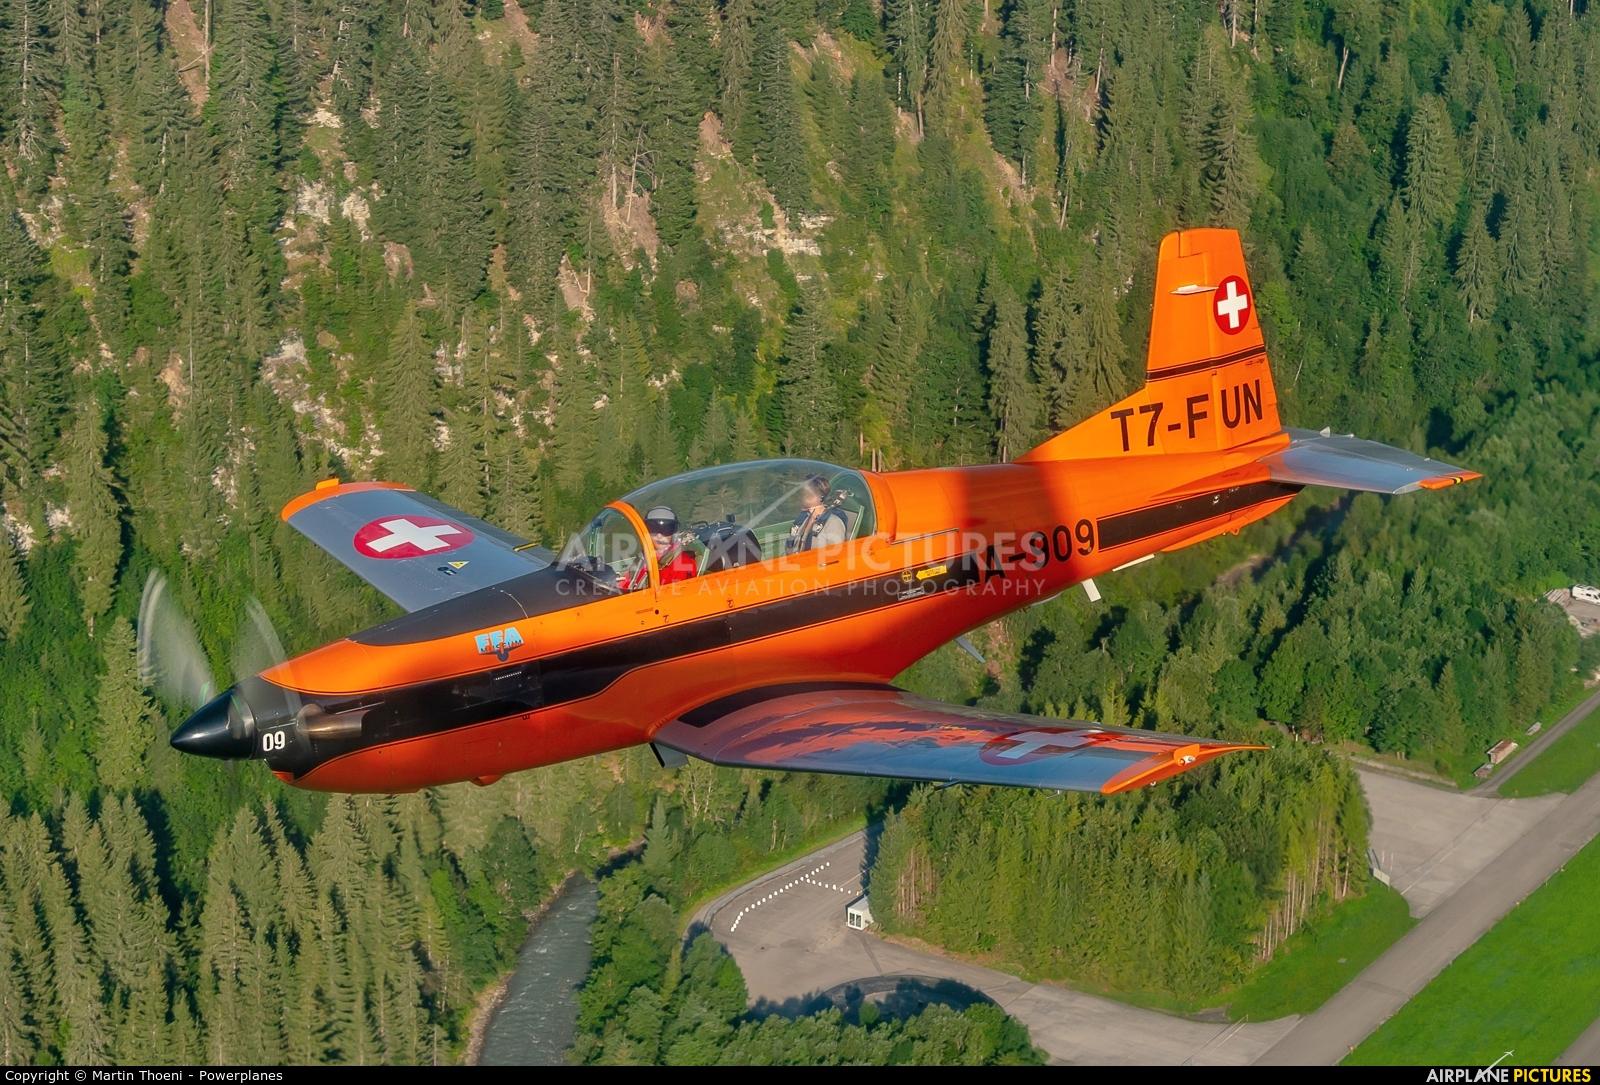 FFA Museum T7-FUN aircraft at St. Stephan